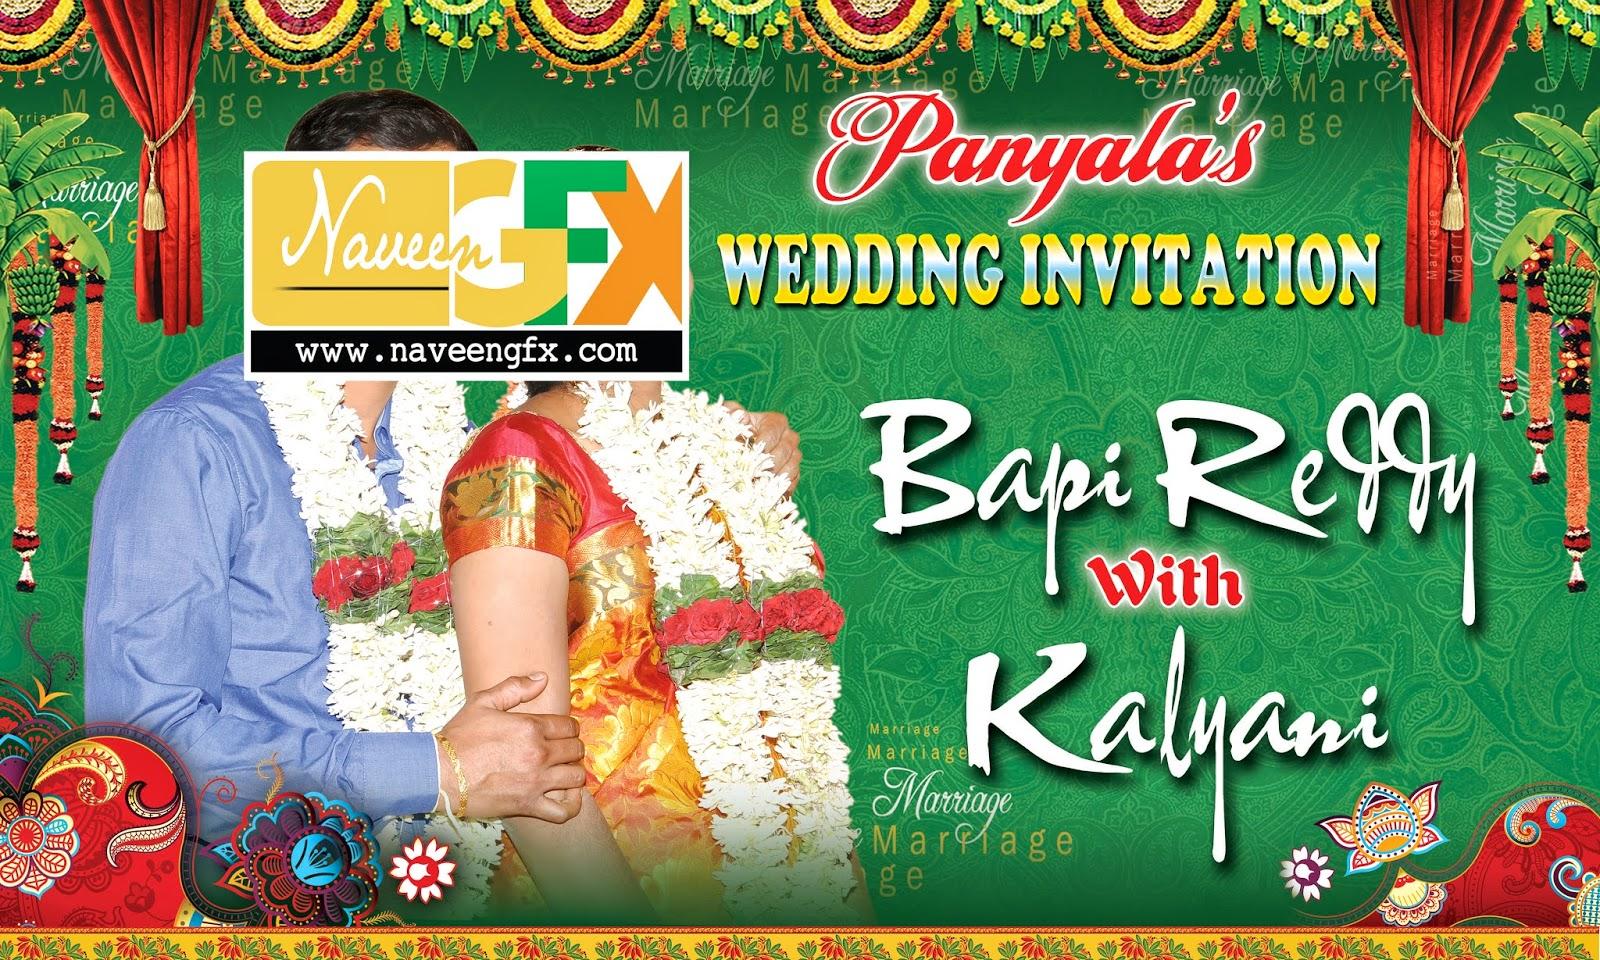 Indian wedding banner templates